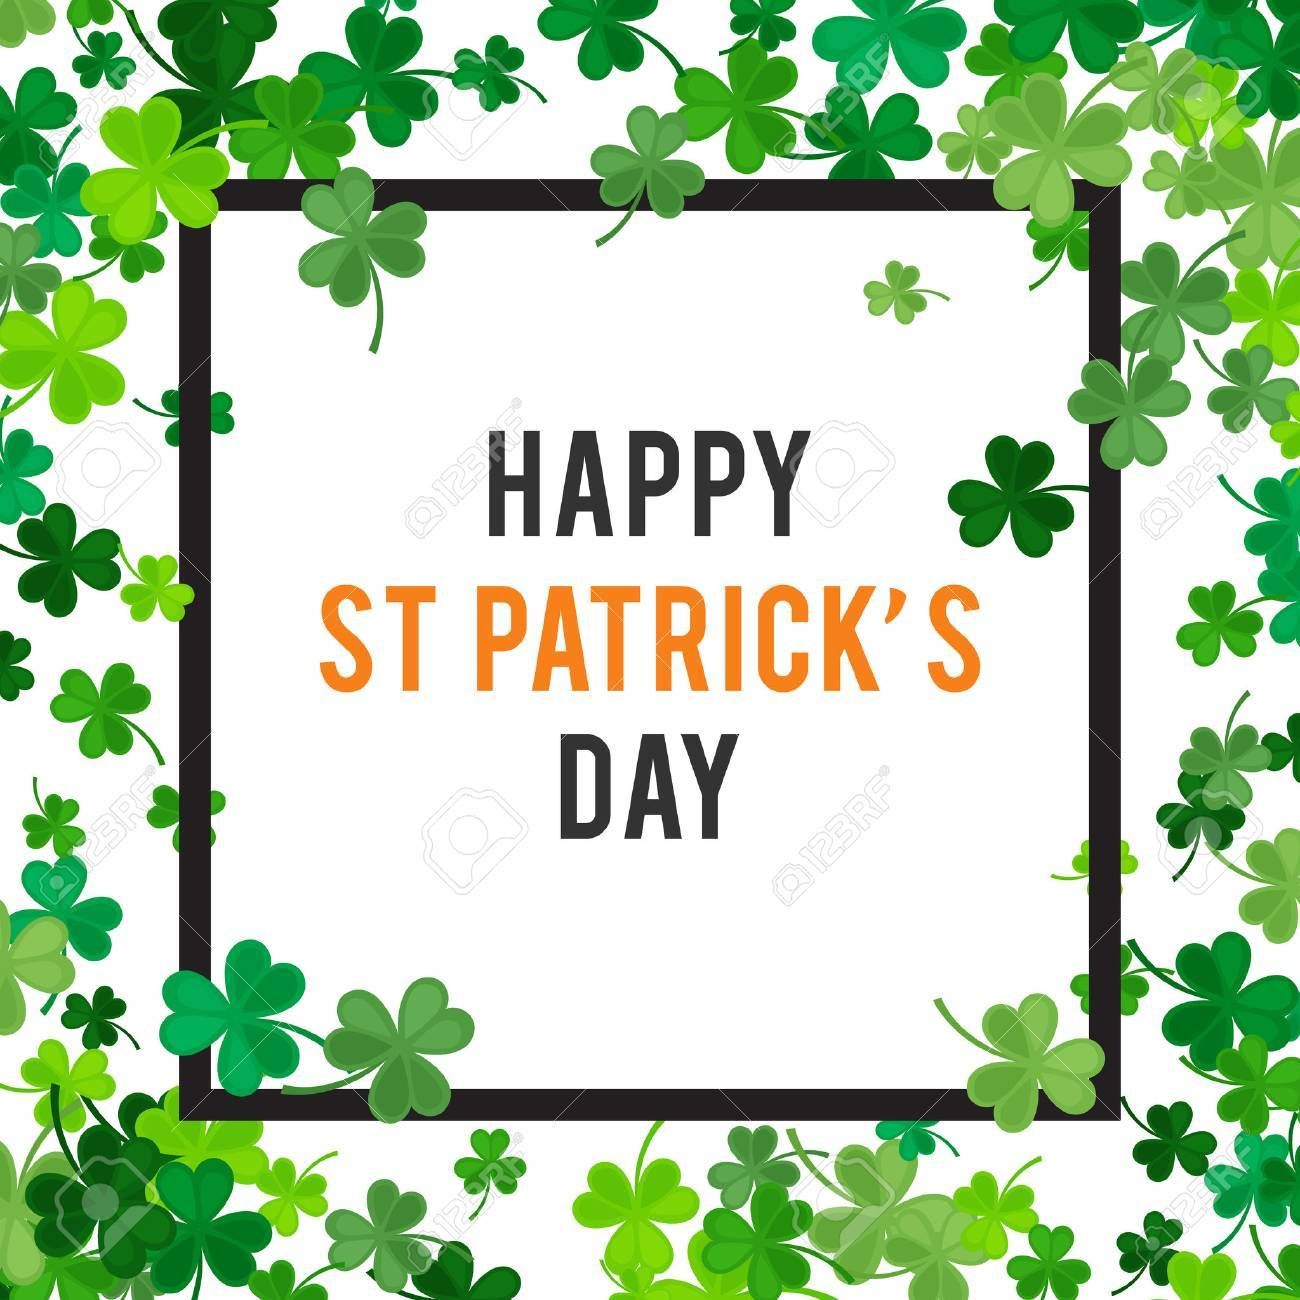 St Patrick's Day background. - 53120385